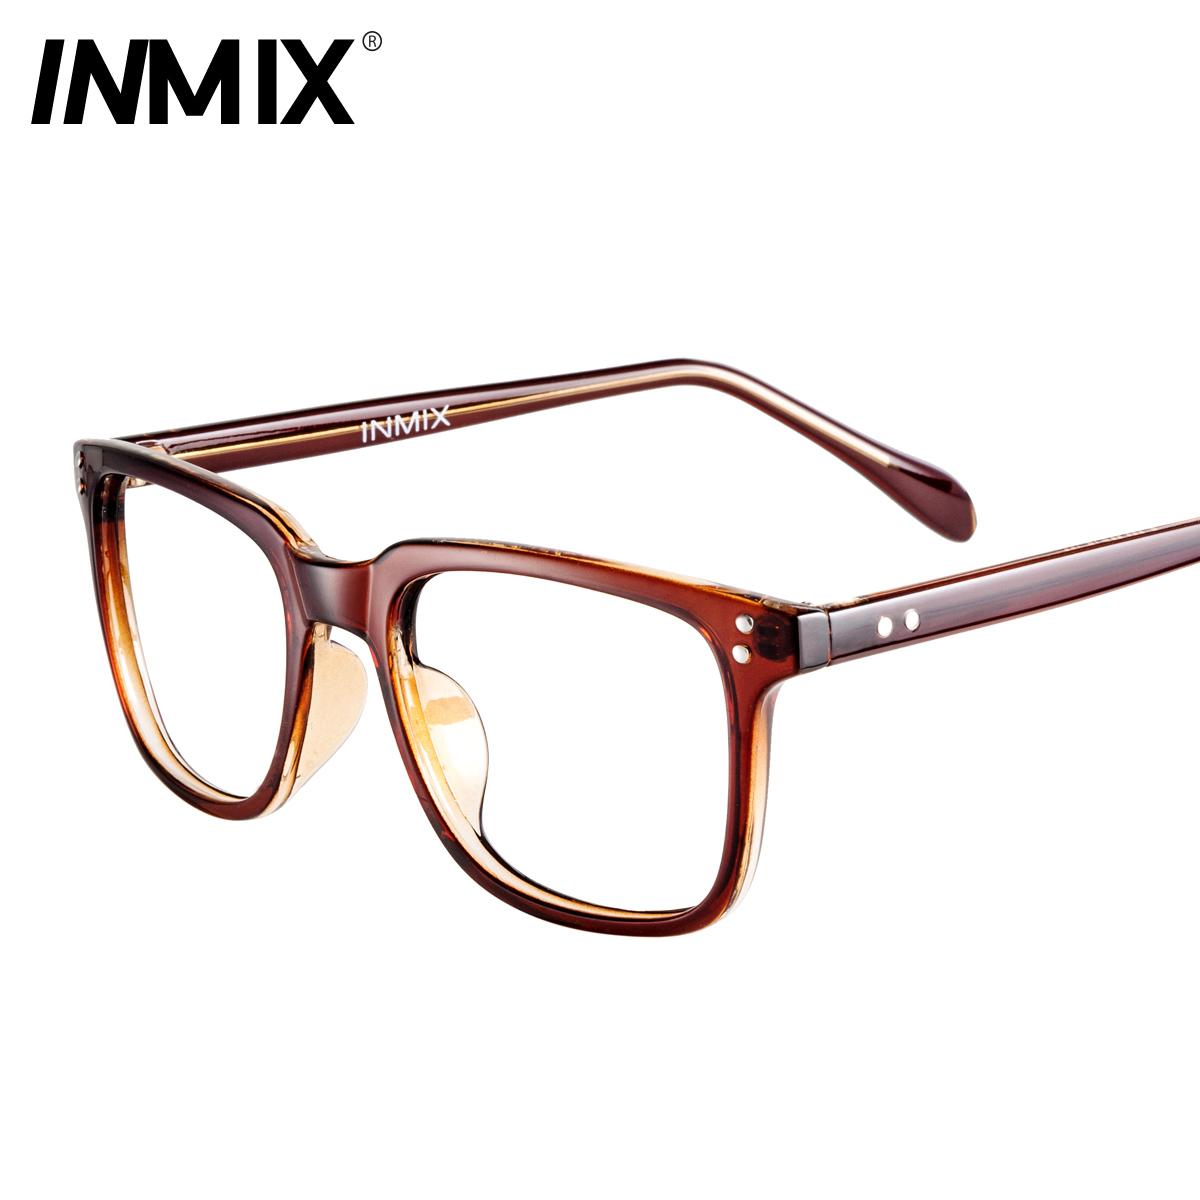 Big Frame Eyeglasses : Black big inmix box myopia glasses frame myopia Women ...